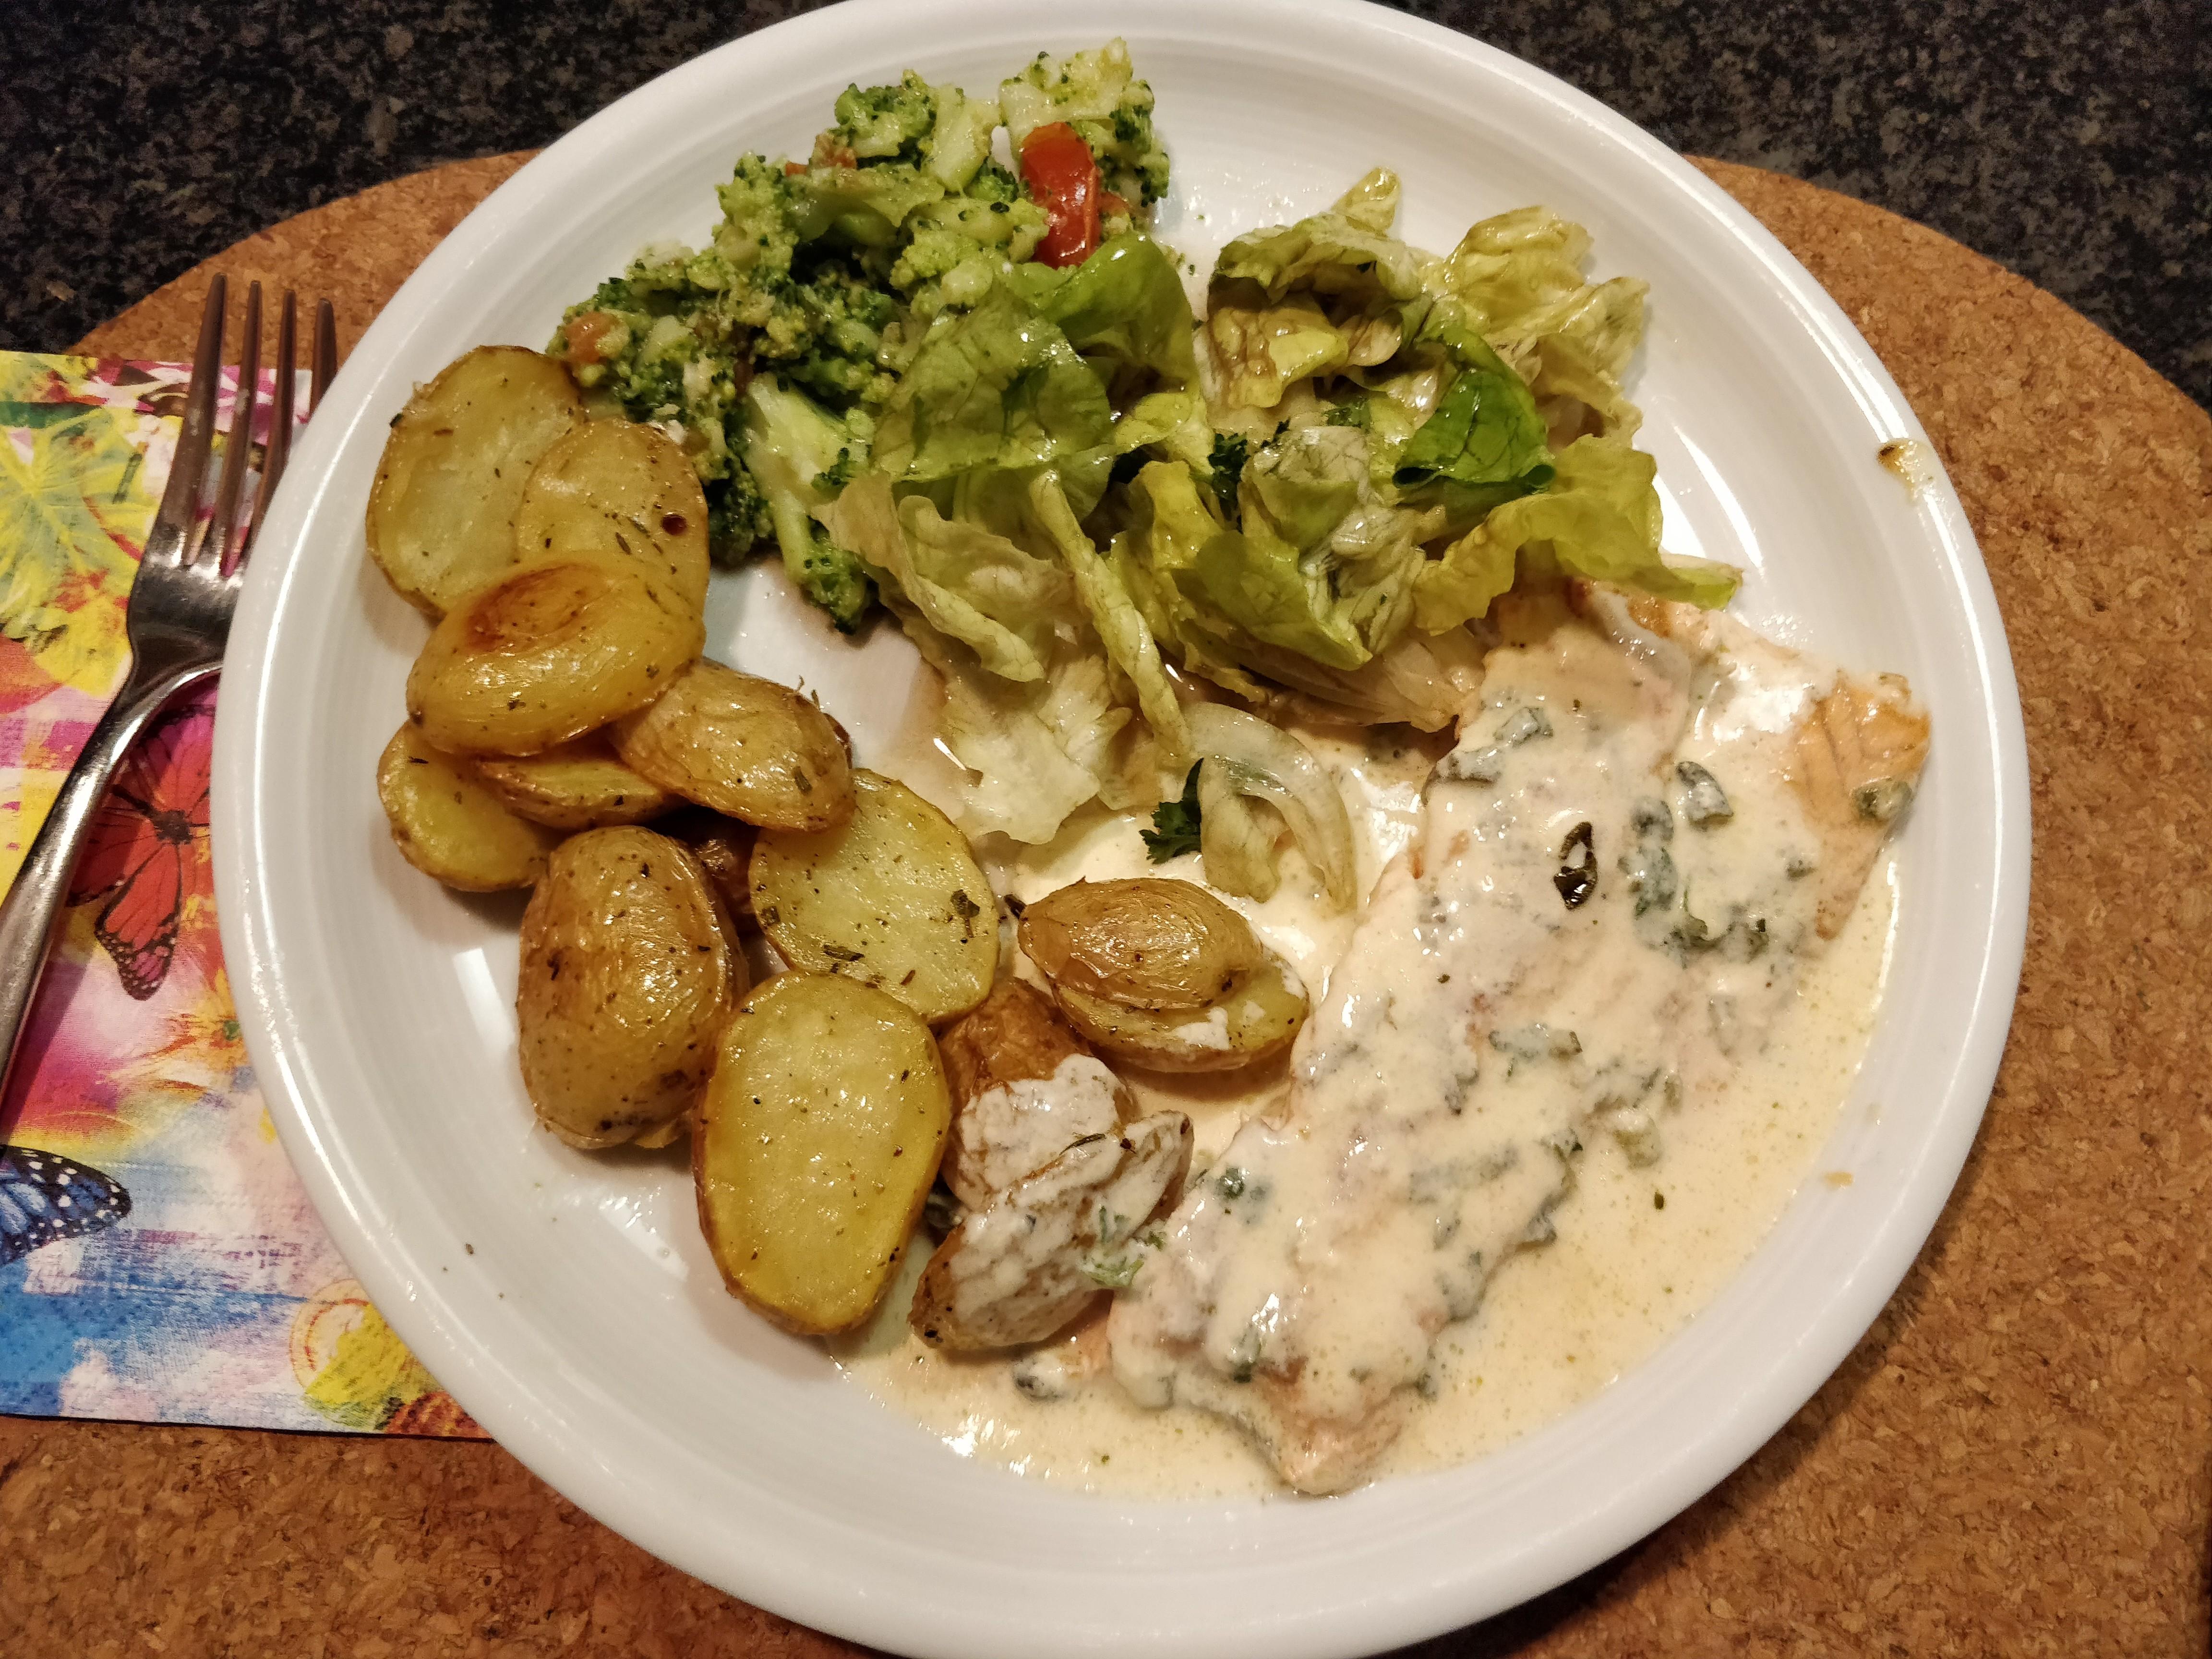 https://foodloader.net/nico_2018-11-18_lachs-kartoffeln-salat.jpg